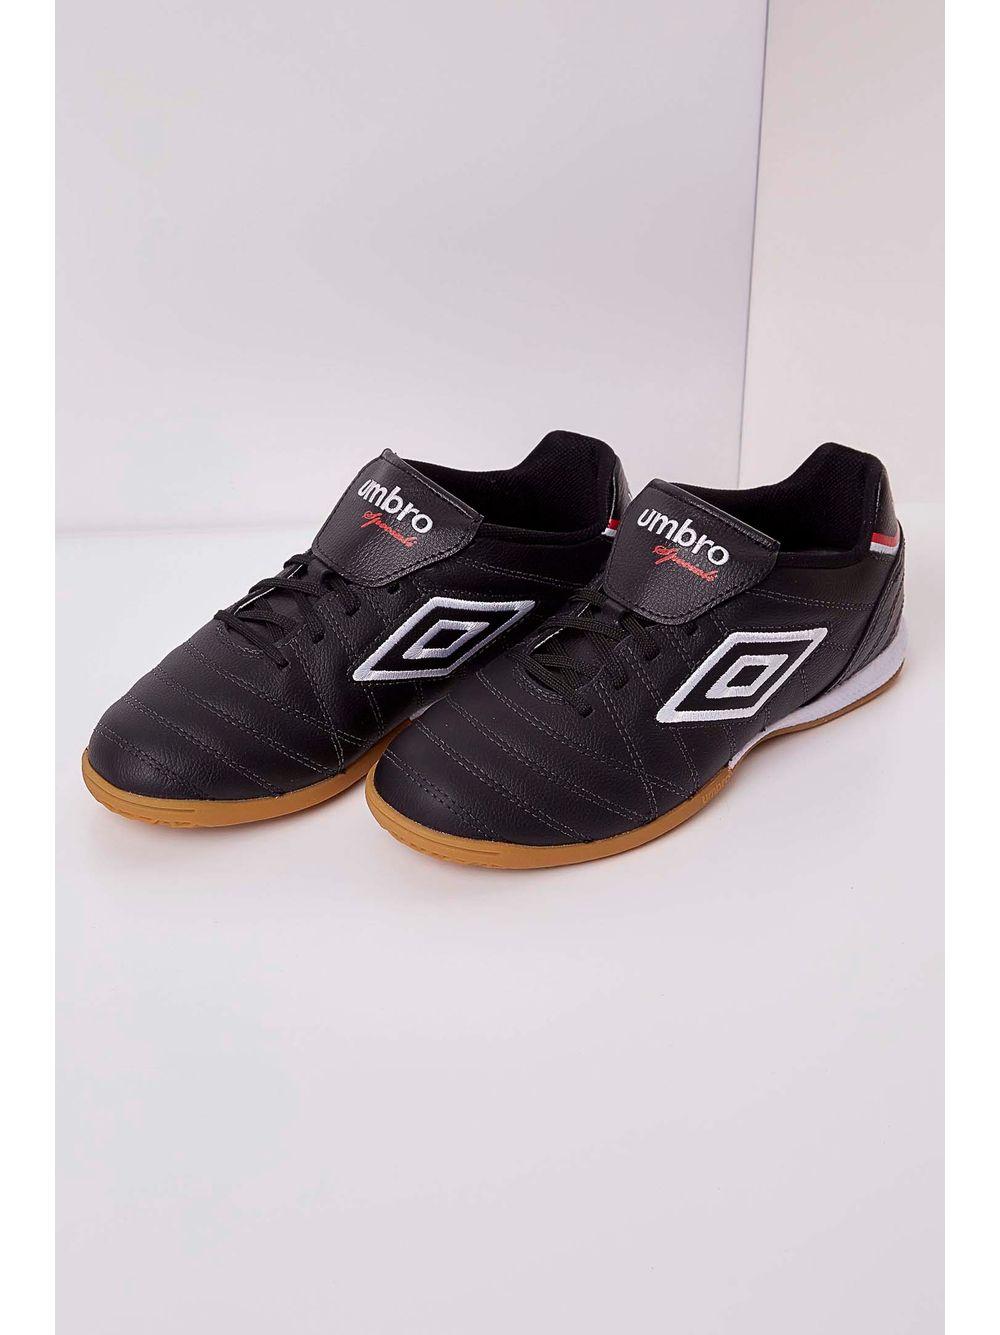 d5a4971865 Tênis Futsal Umbro Speciali Premier 0f72064 Preto - pittol